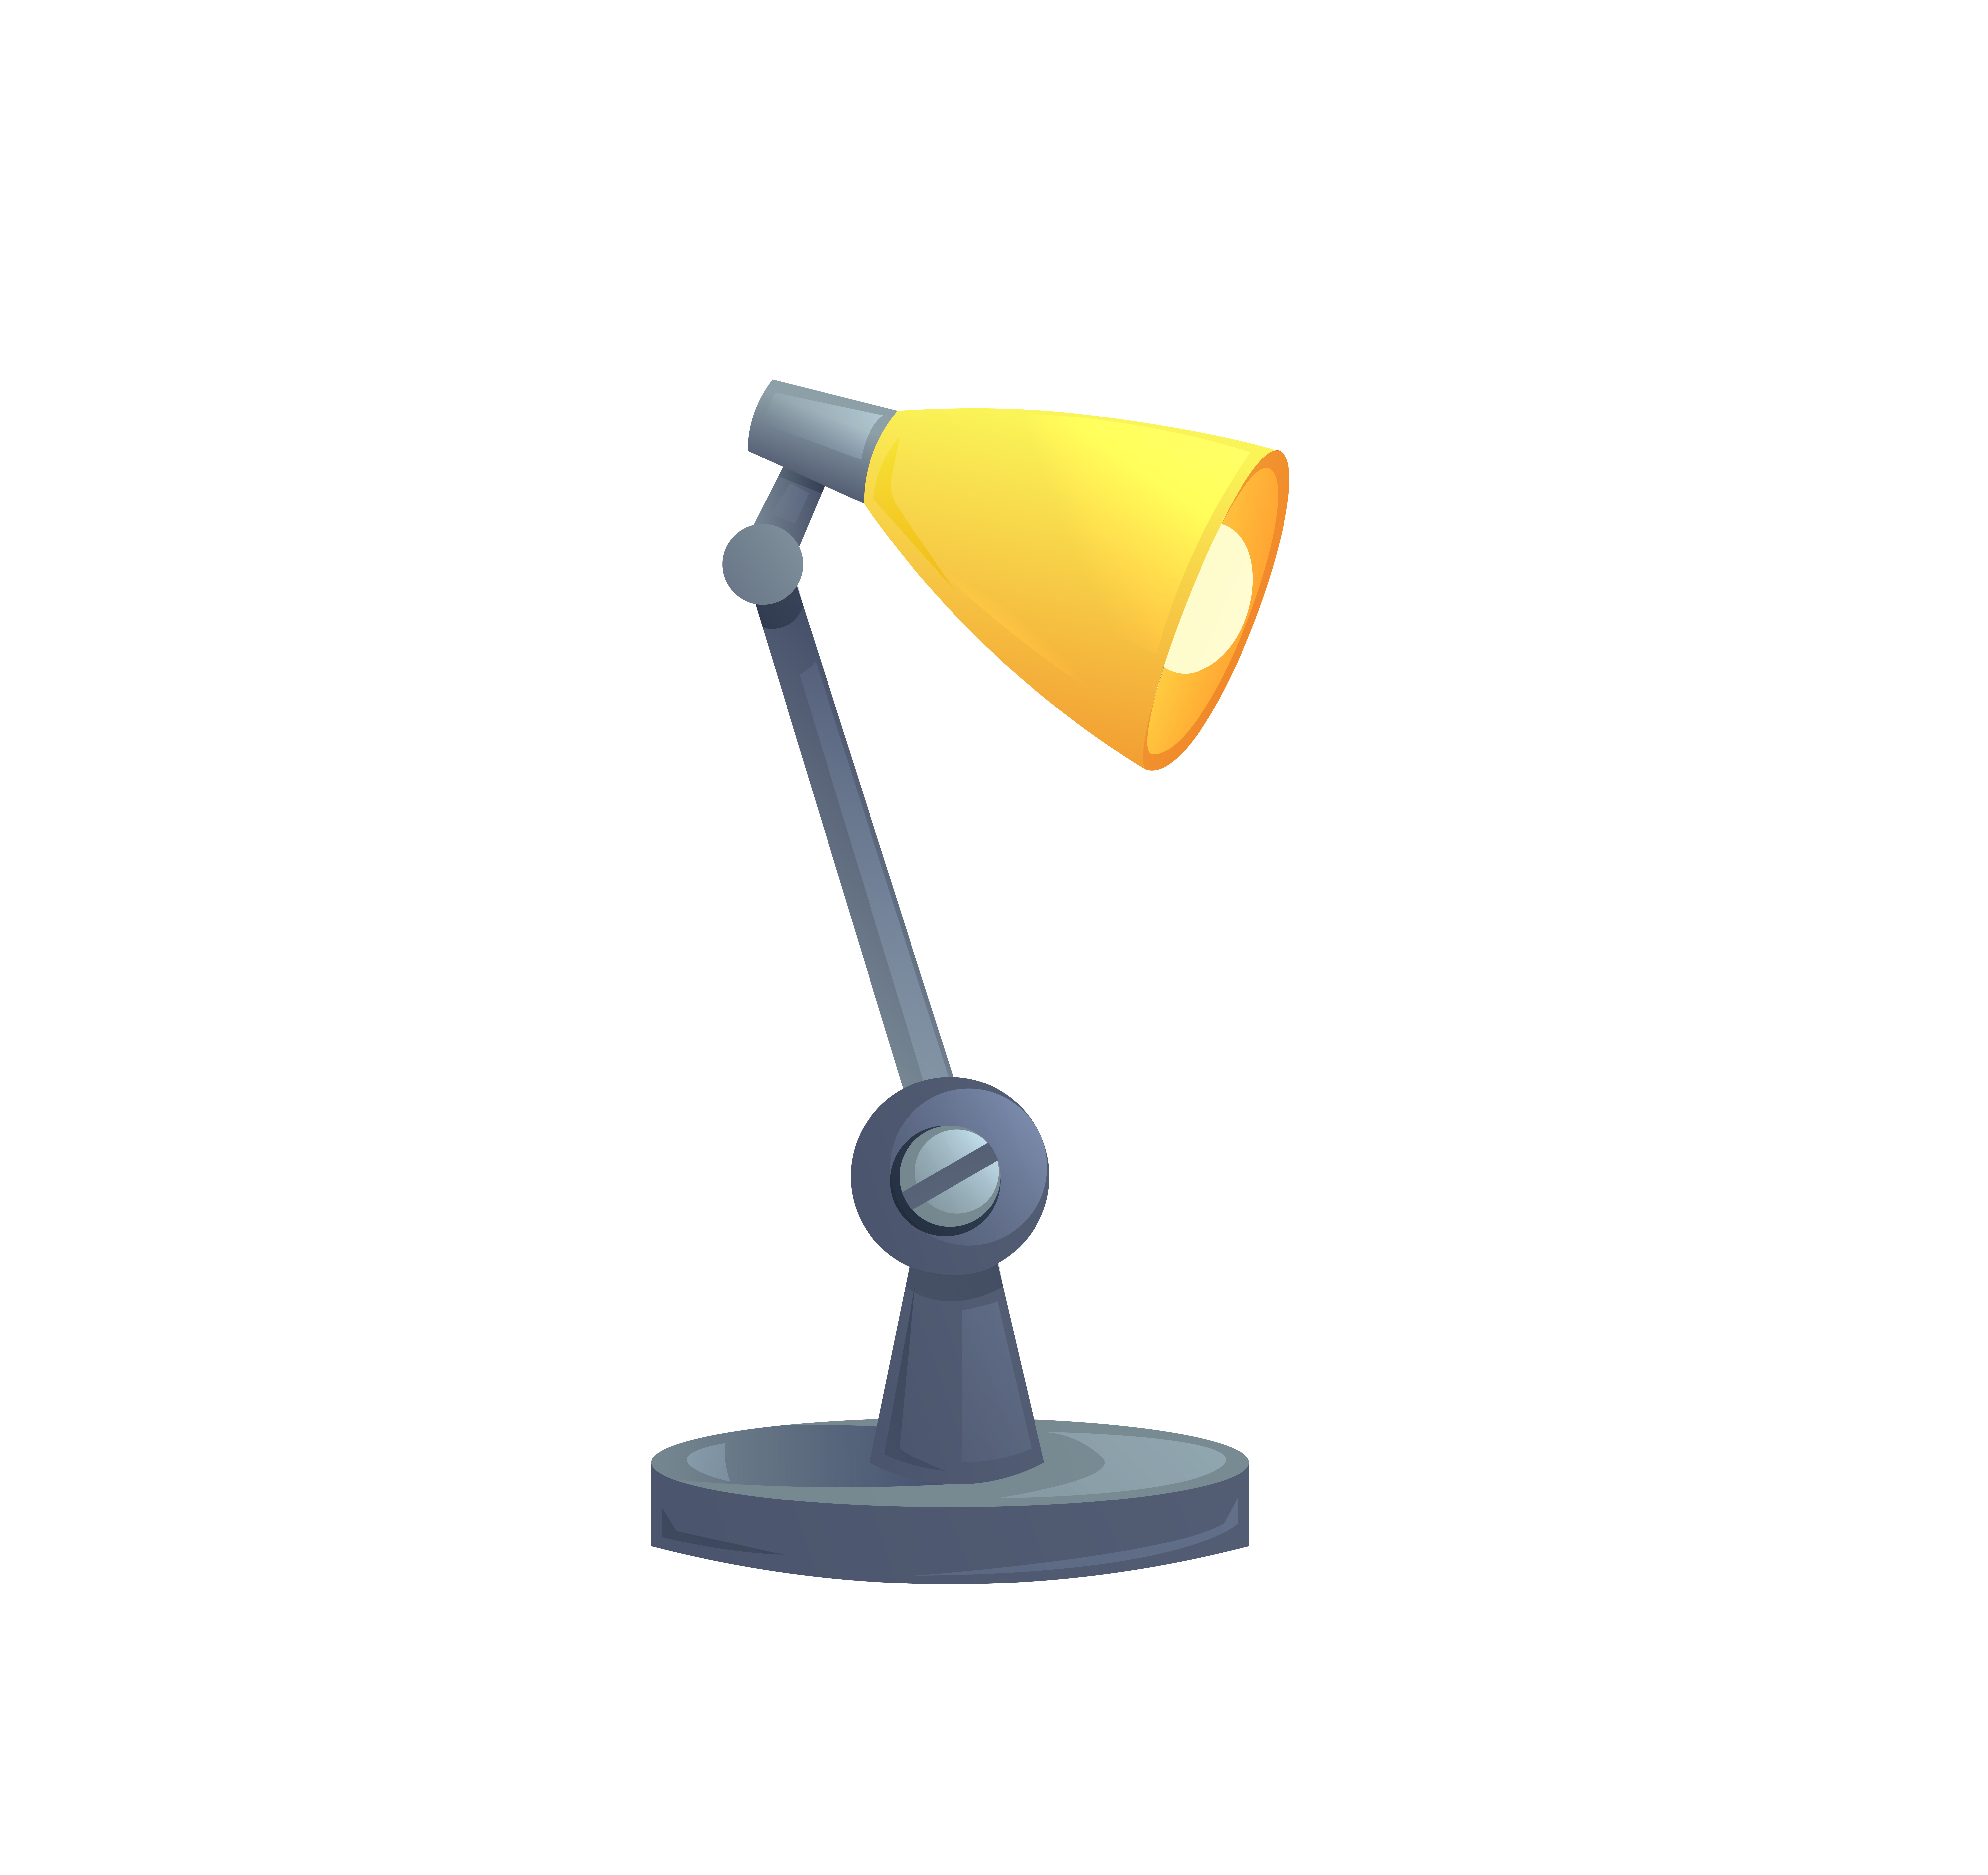 Table Office Lamp Isolated Vector Cartoon Illustration